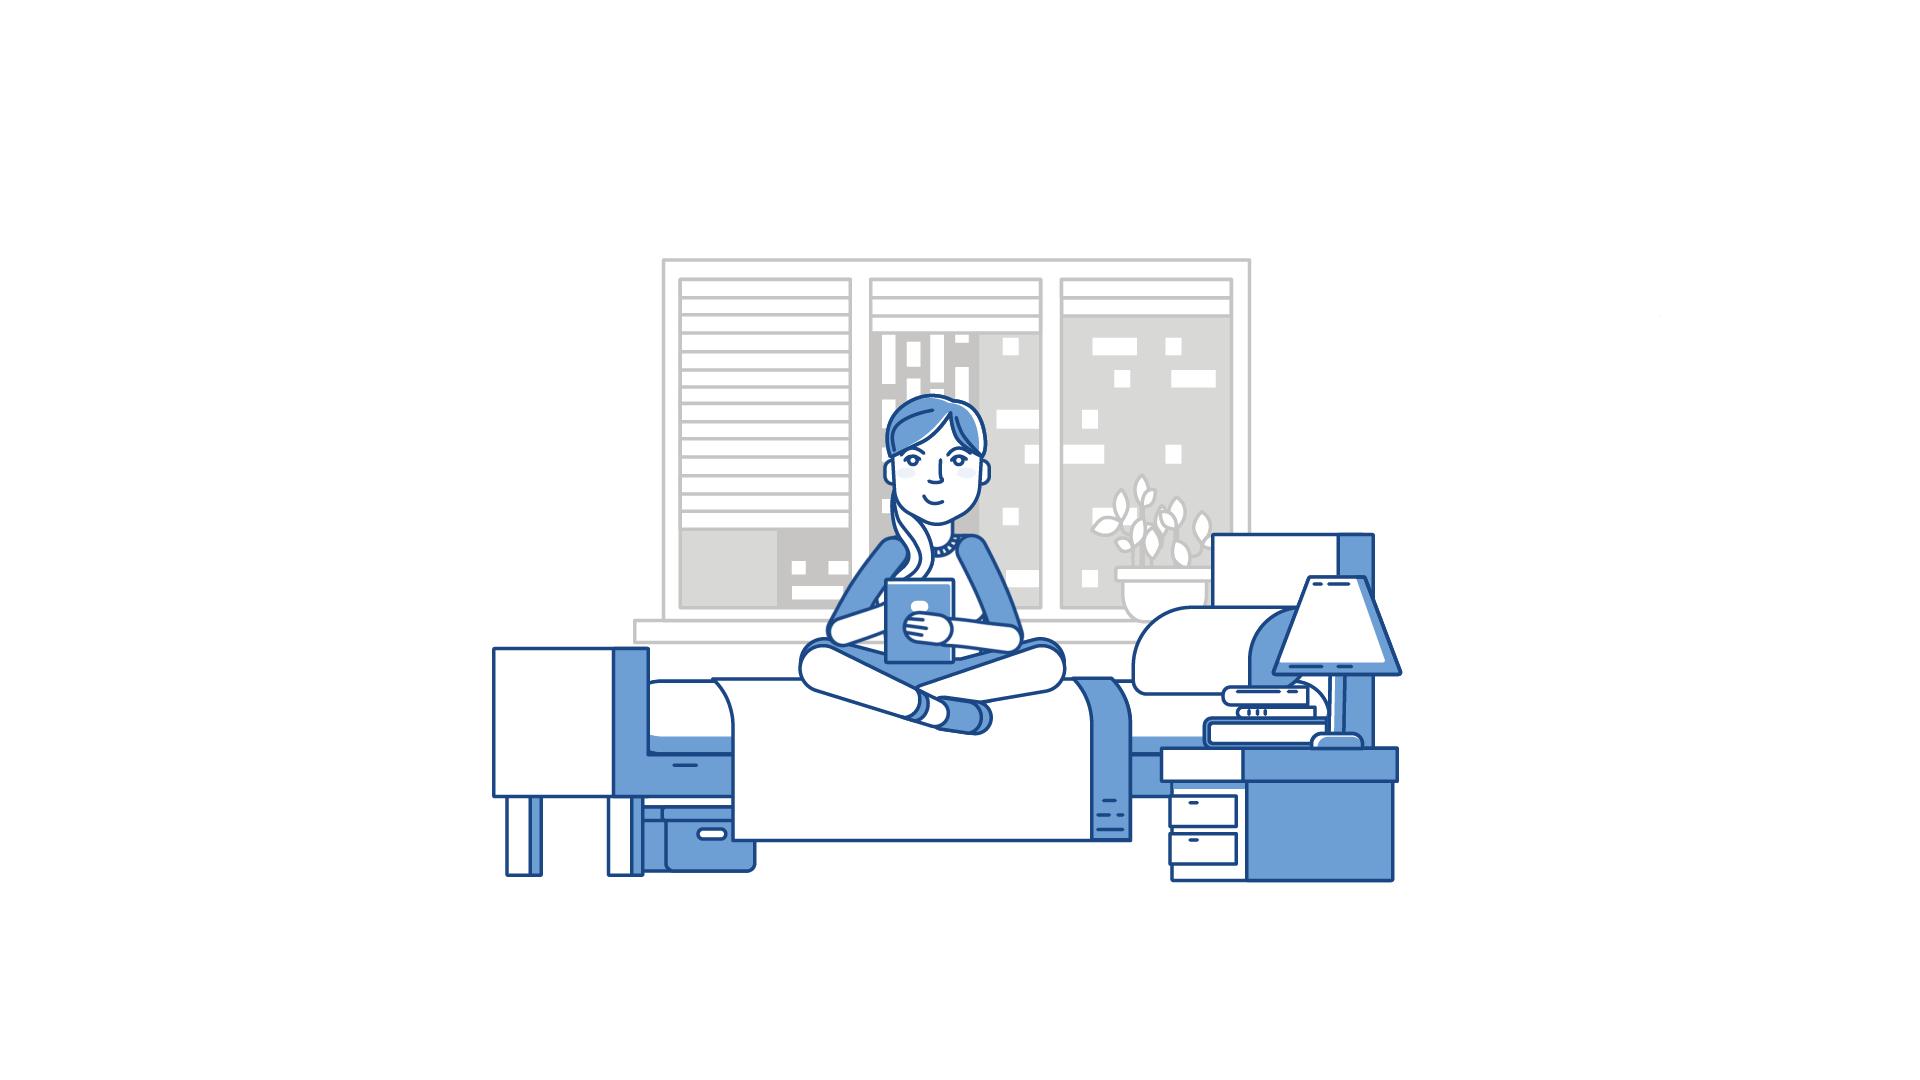 Mist Visual - Studio Animacji. Dziesiąte ilustracja do animacji NASK DNSSEC Video Explainer